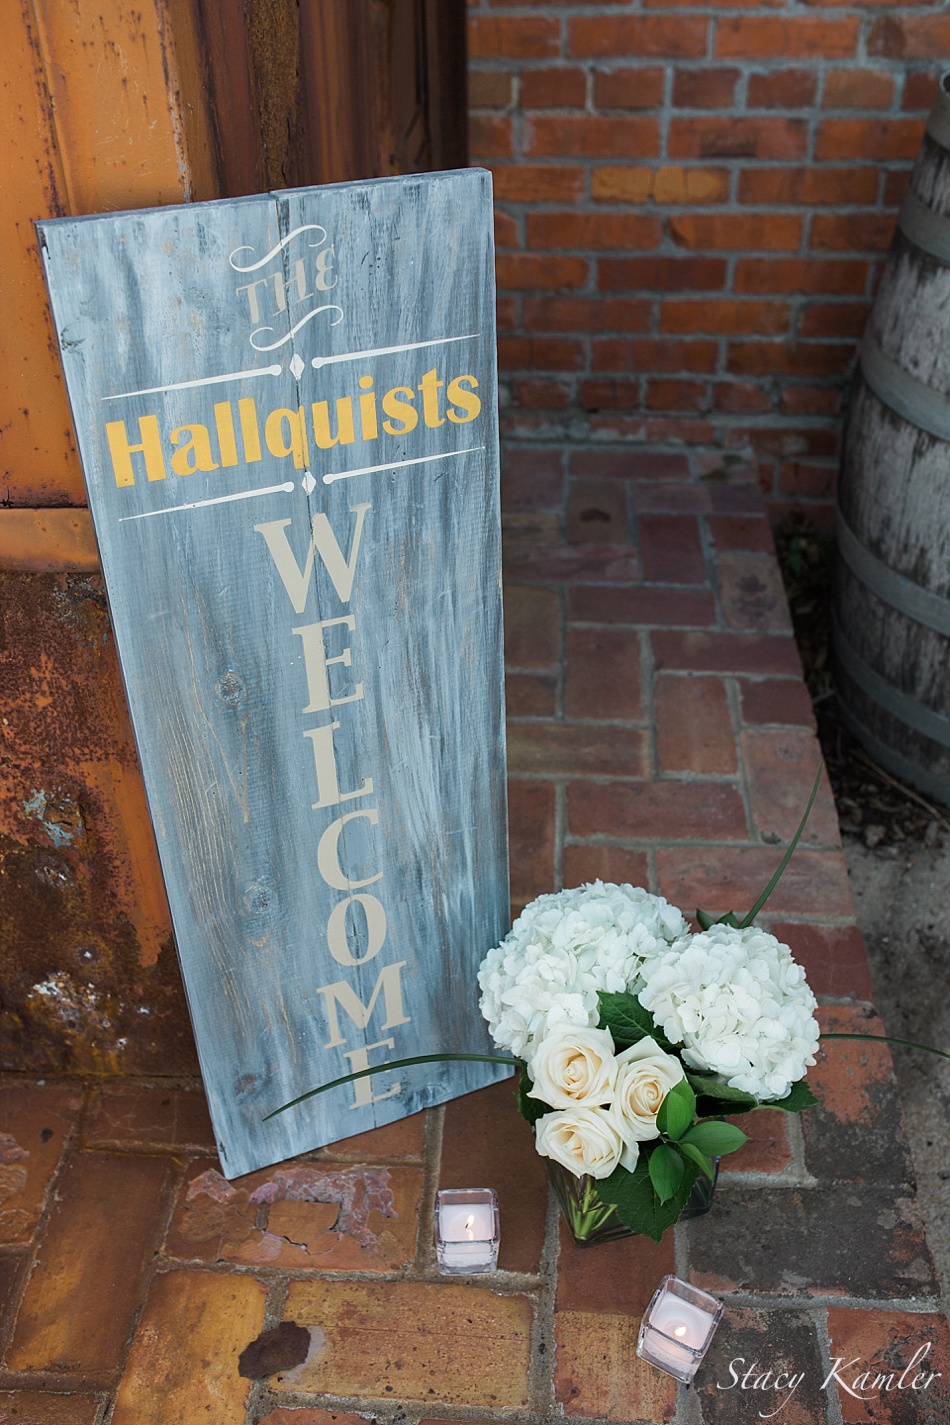 The Hallquists